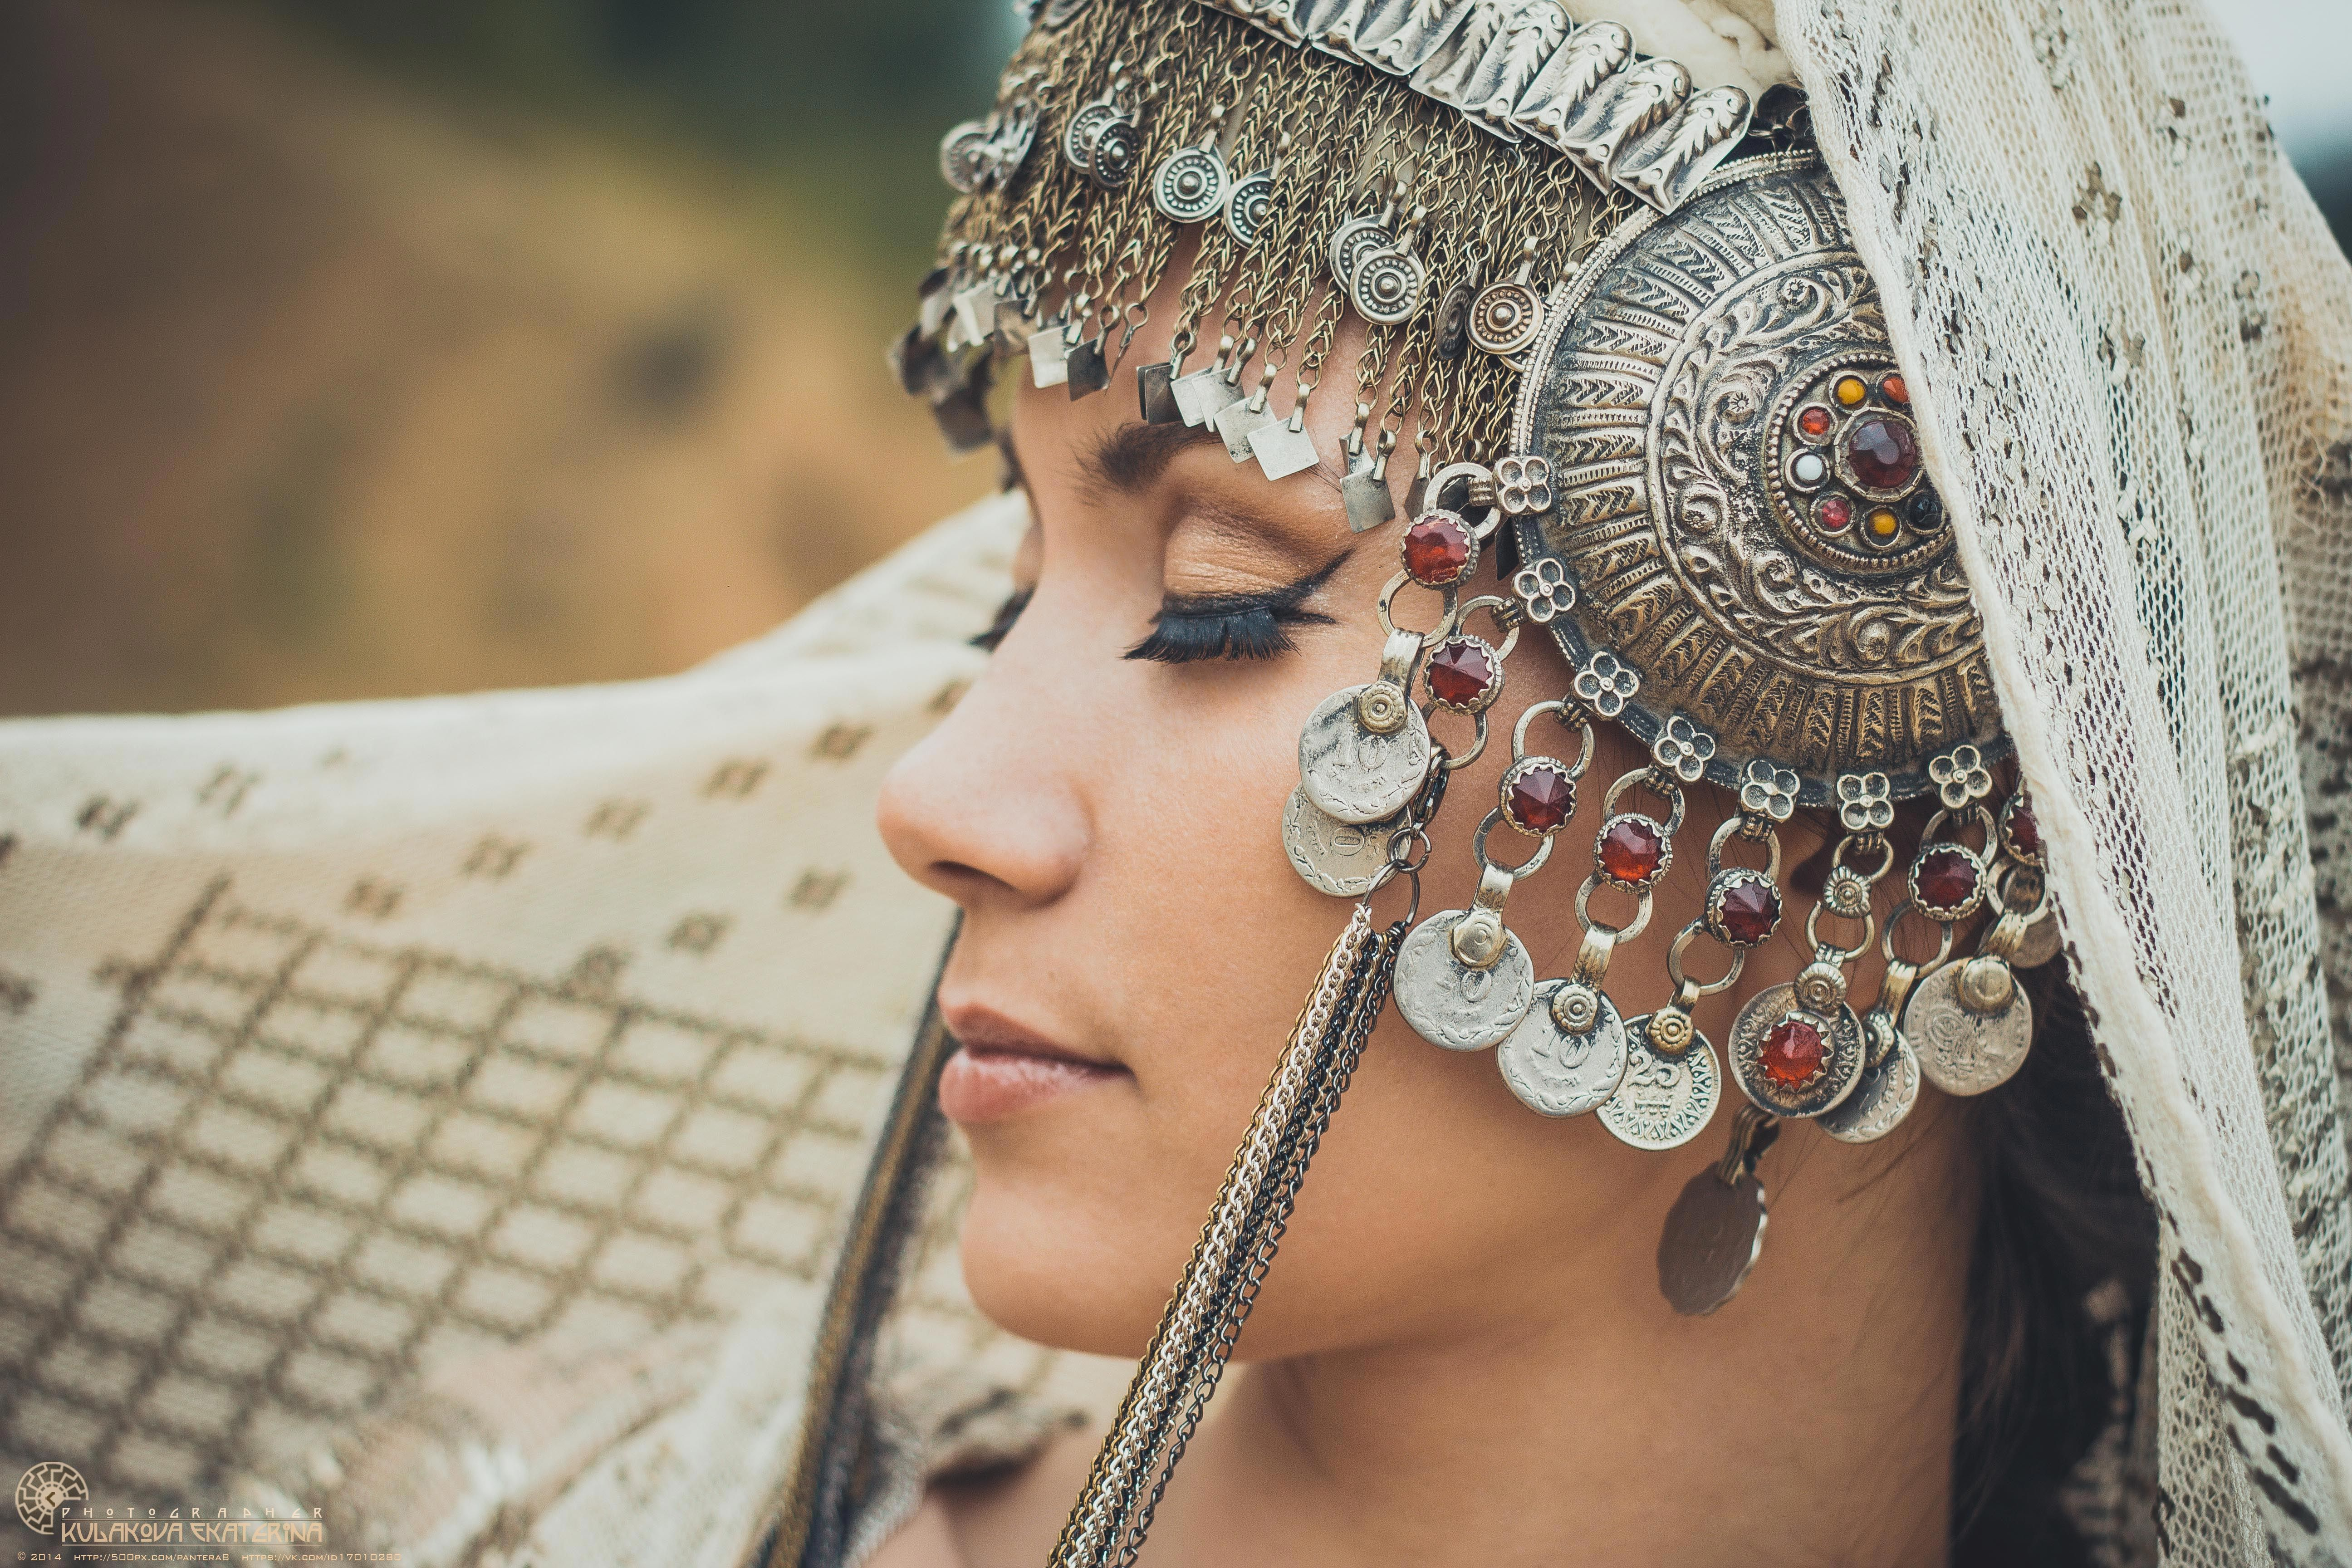 Roxana Bashkirova, Ethno - Tribal photoset, Photographer Kulakova Ekaterina